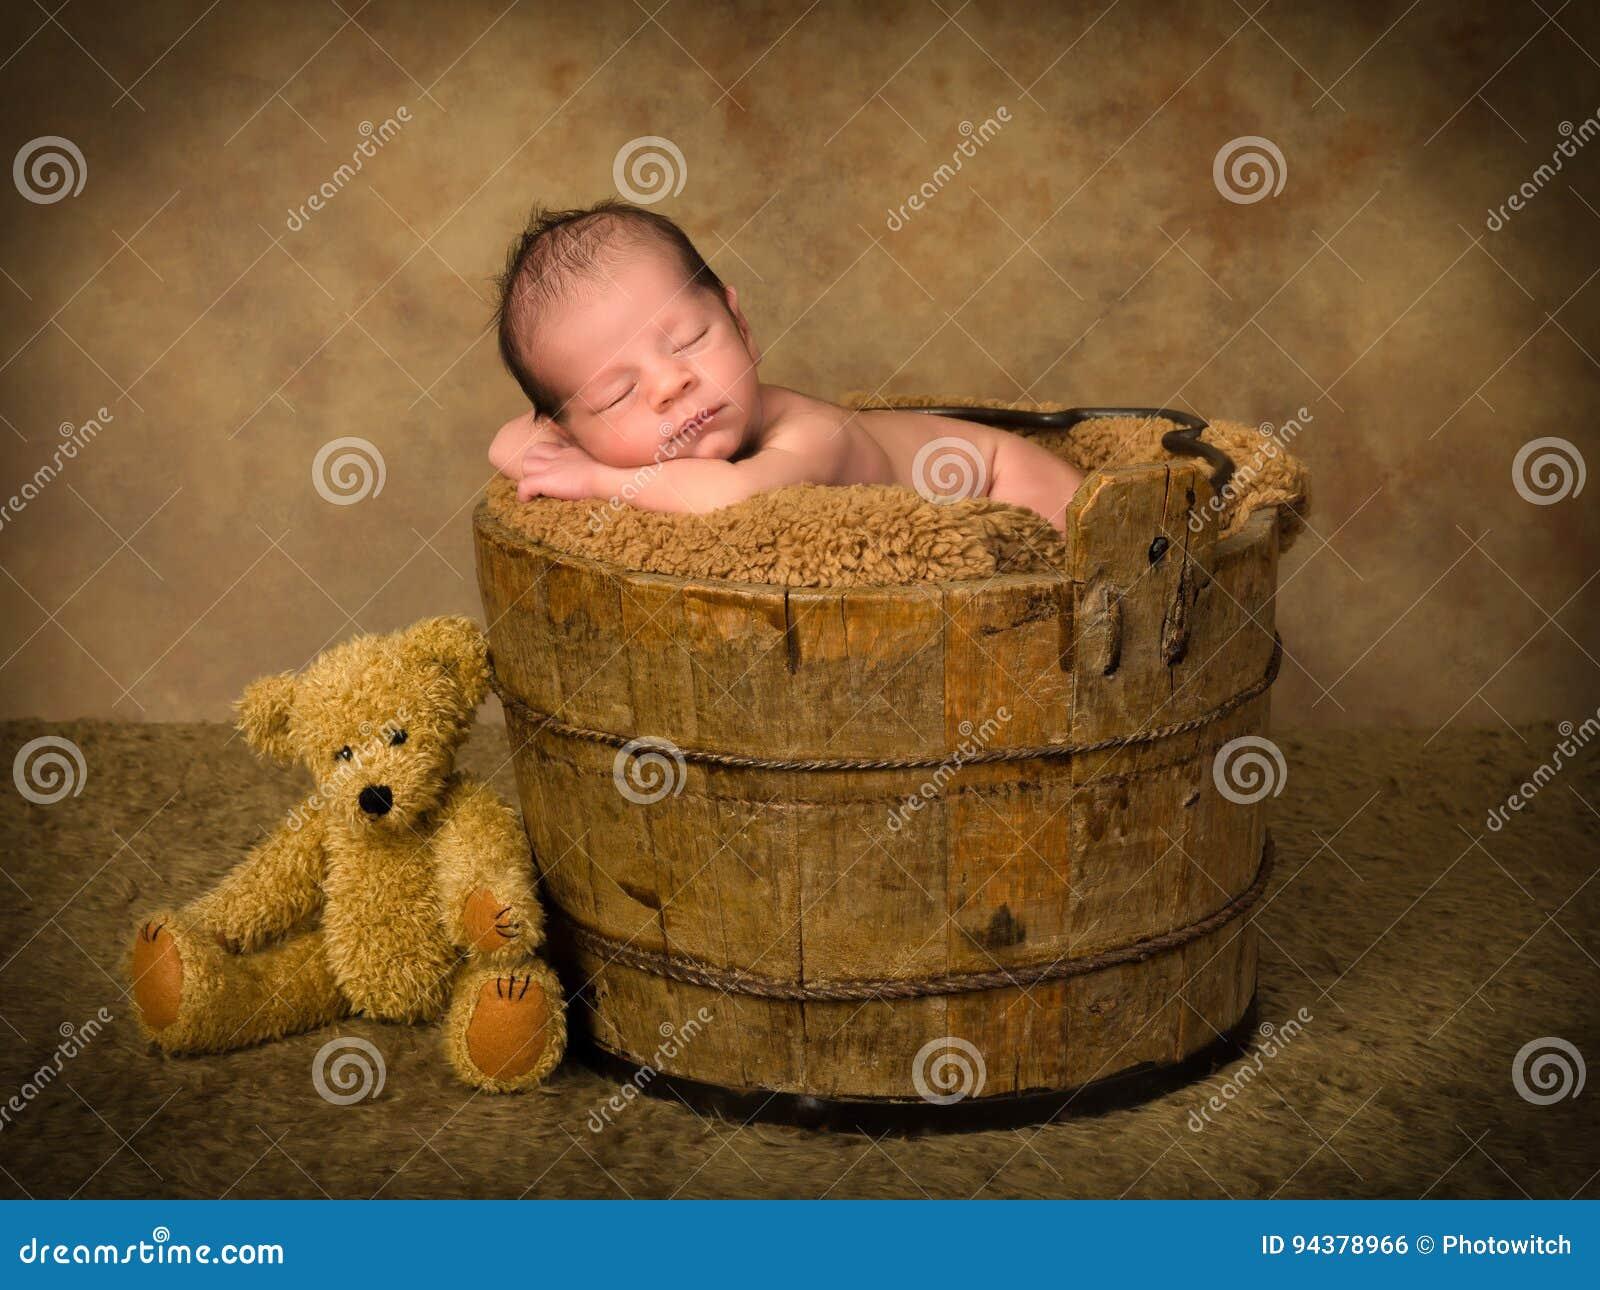 Sleeping Baby In Antique Bucket Stock Photo - Image of teddy, animal ...